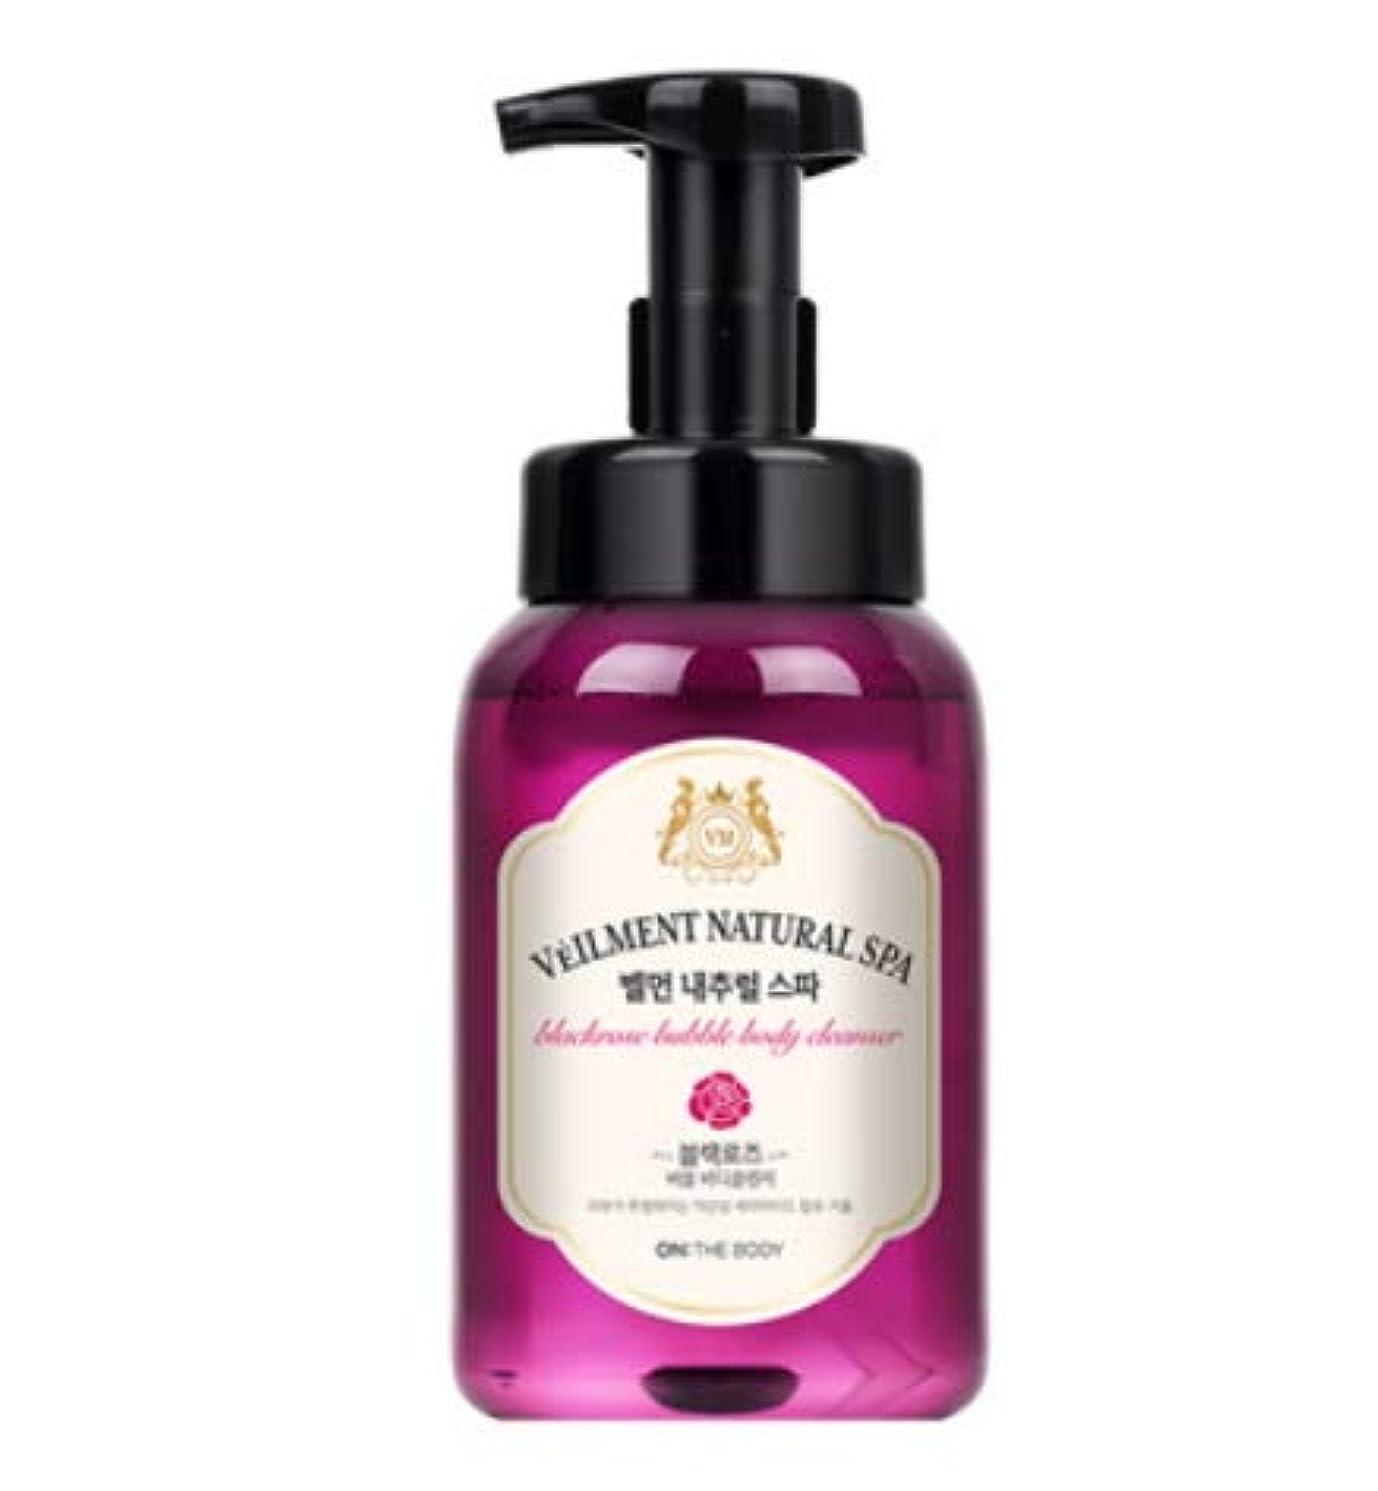 [LG HnB] On the Body Belman Natural Spa Bubble Body Cleanser/オンザボディベルモンナチュラルスパバブルボディクレンザー 500ml x2個(海外直送品)